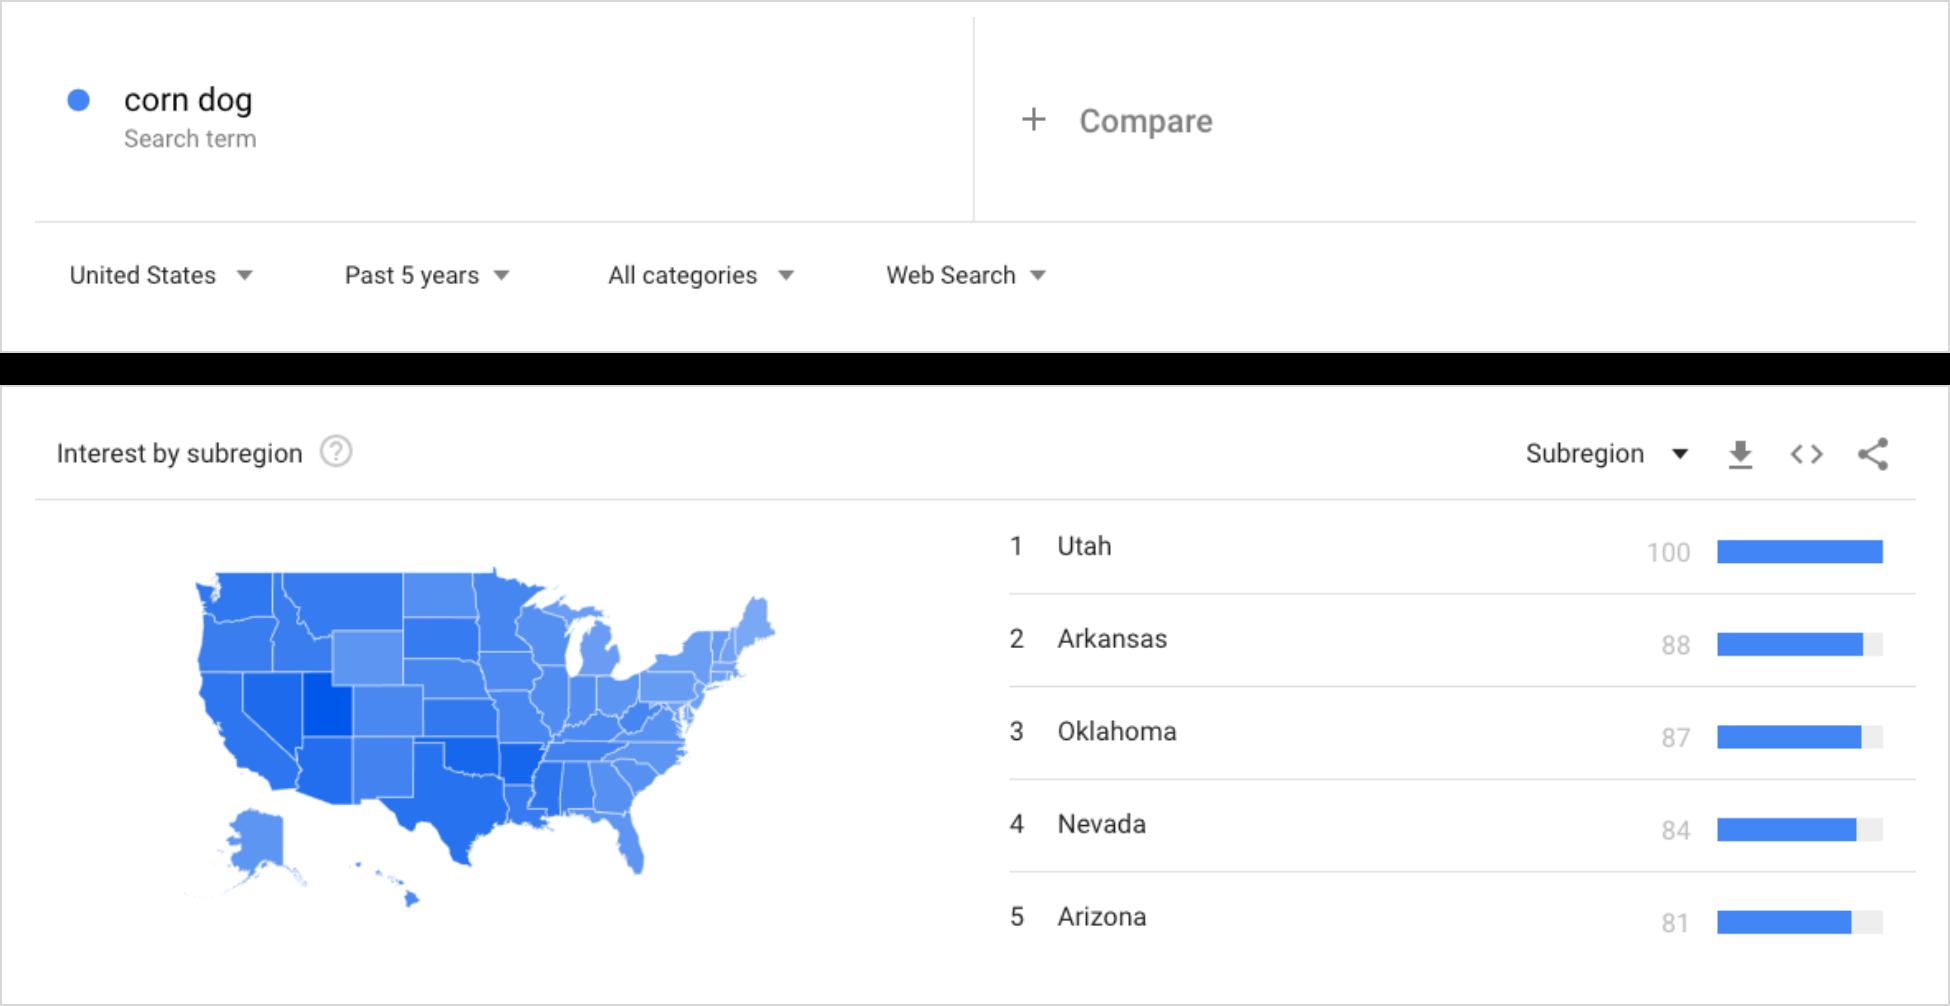 Corn dog - interest by region